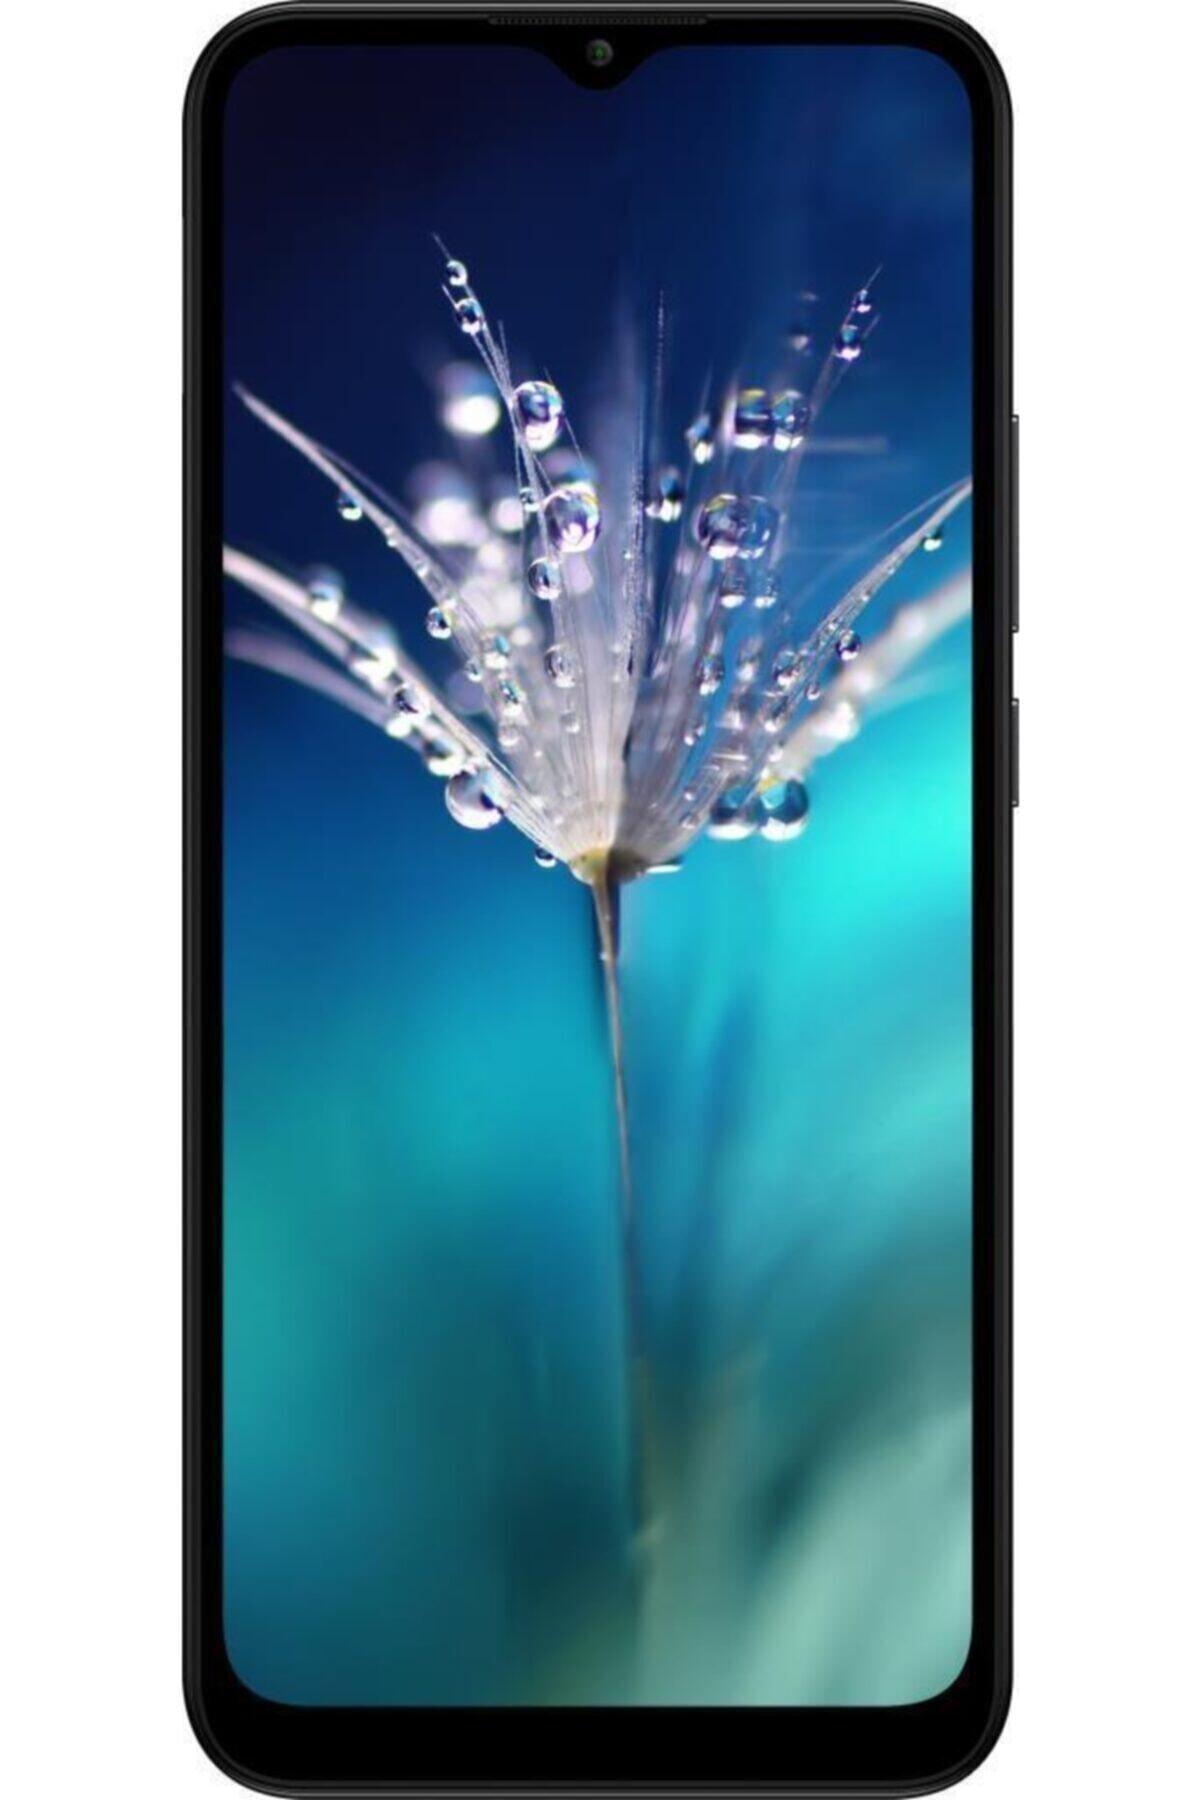 GM 21 32GB Siyah Cep Telefonu (General Mobile Türkiye Garantili)